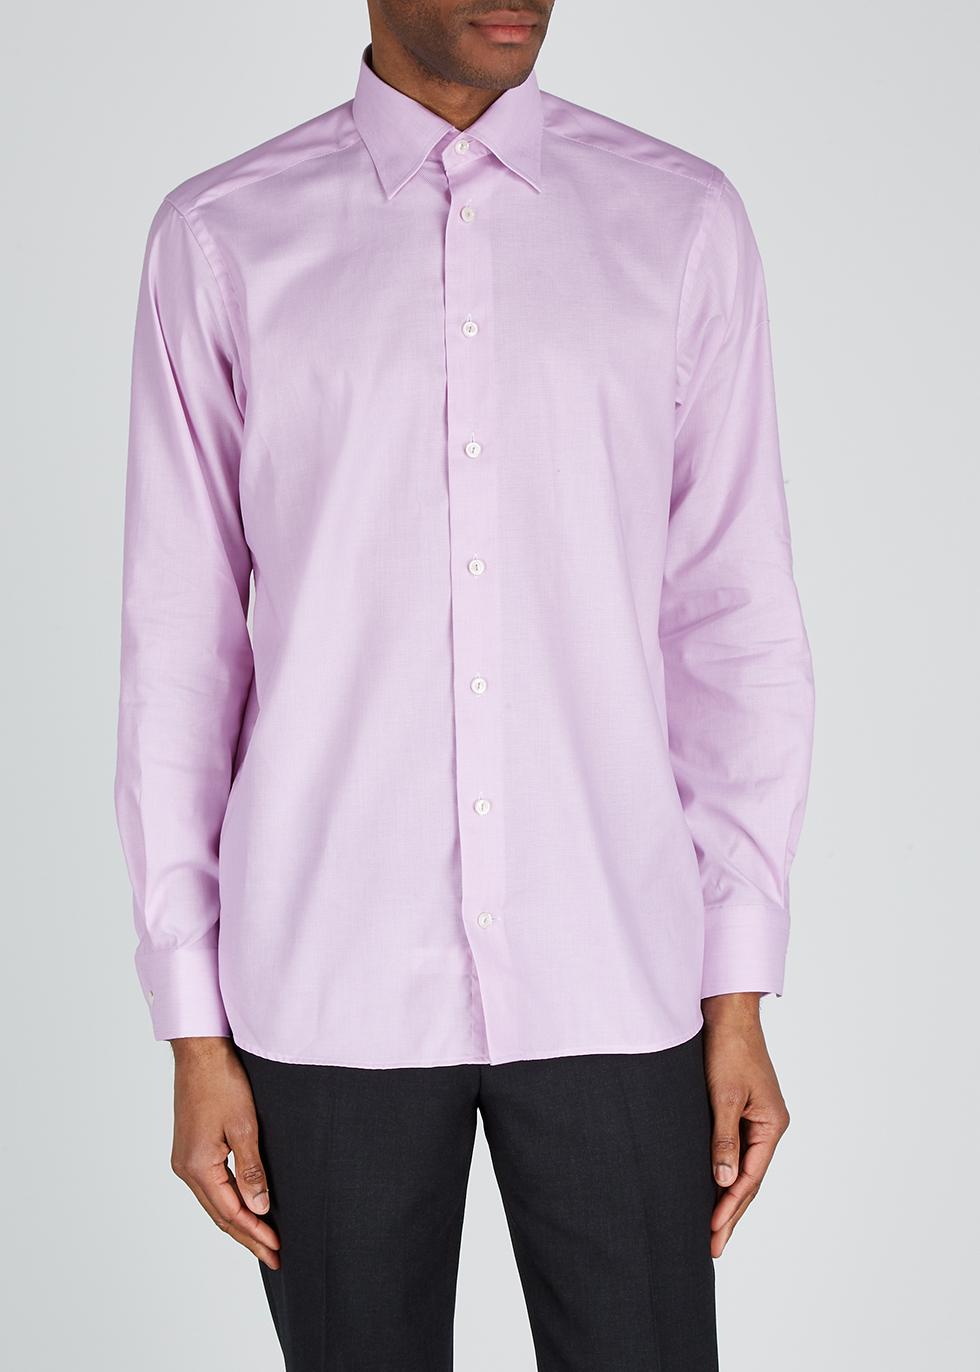 Pink contemporary twill shirt - Eton